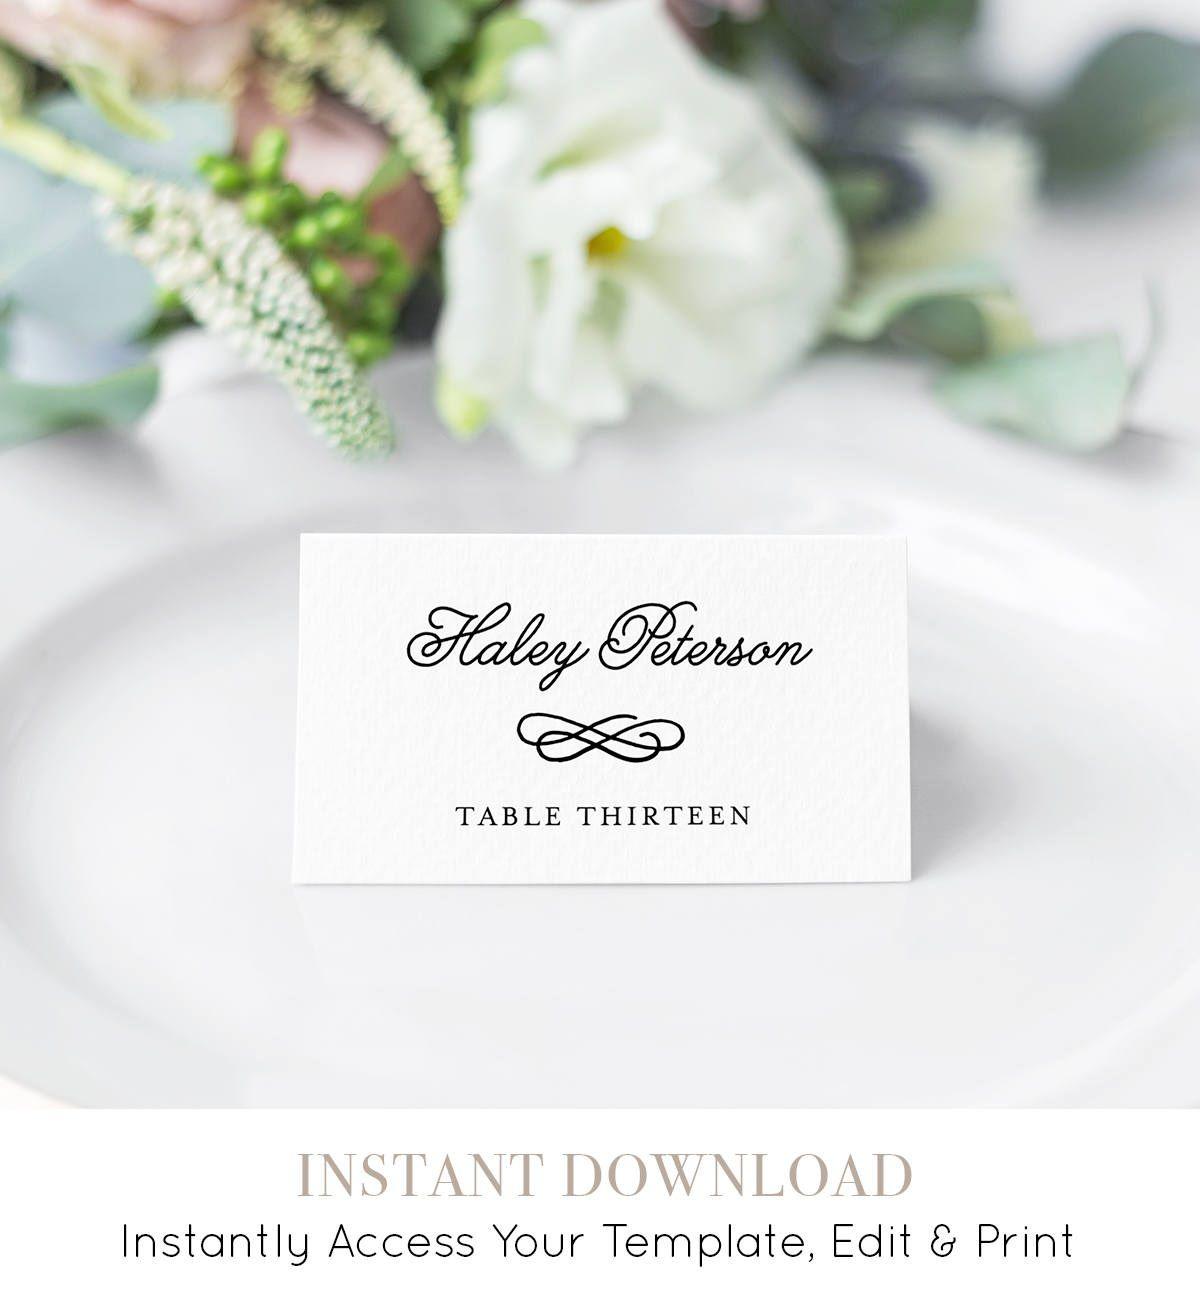 006 Impressive Wedding Name Card Template Example  Free Download Design Sticker FormatFull